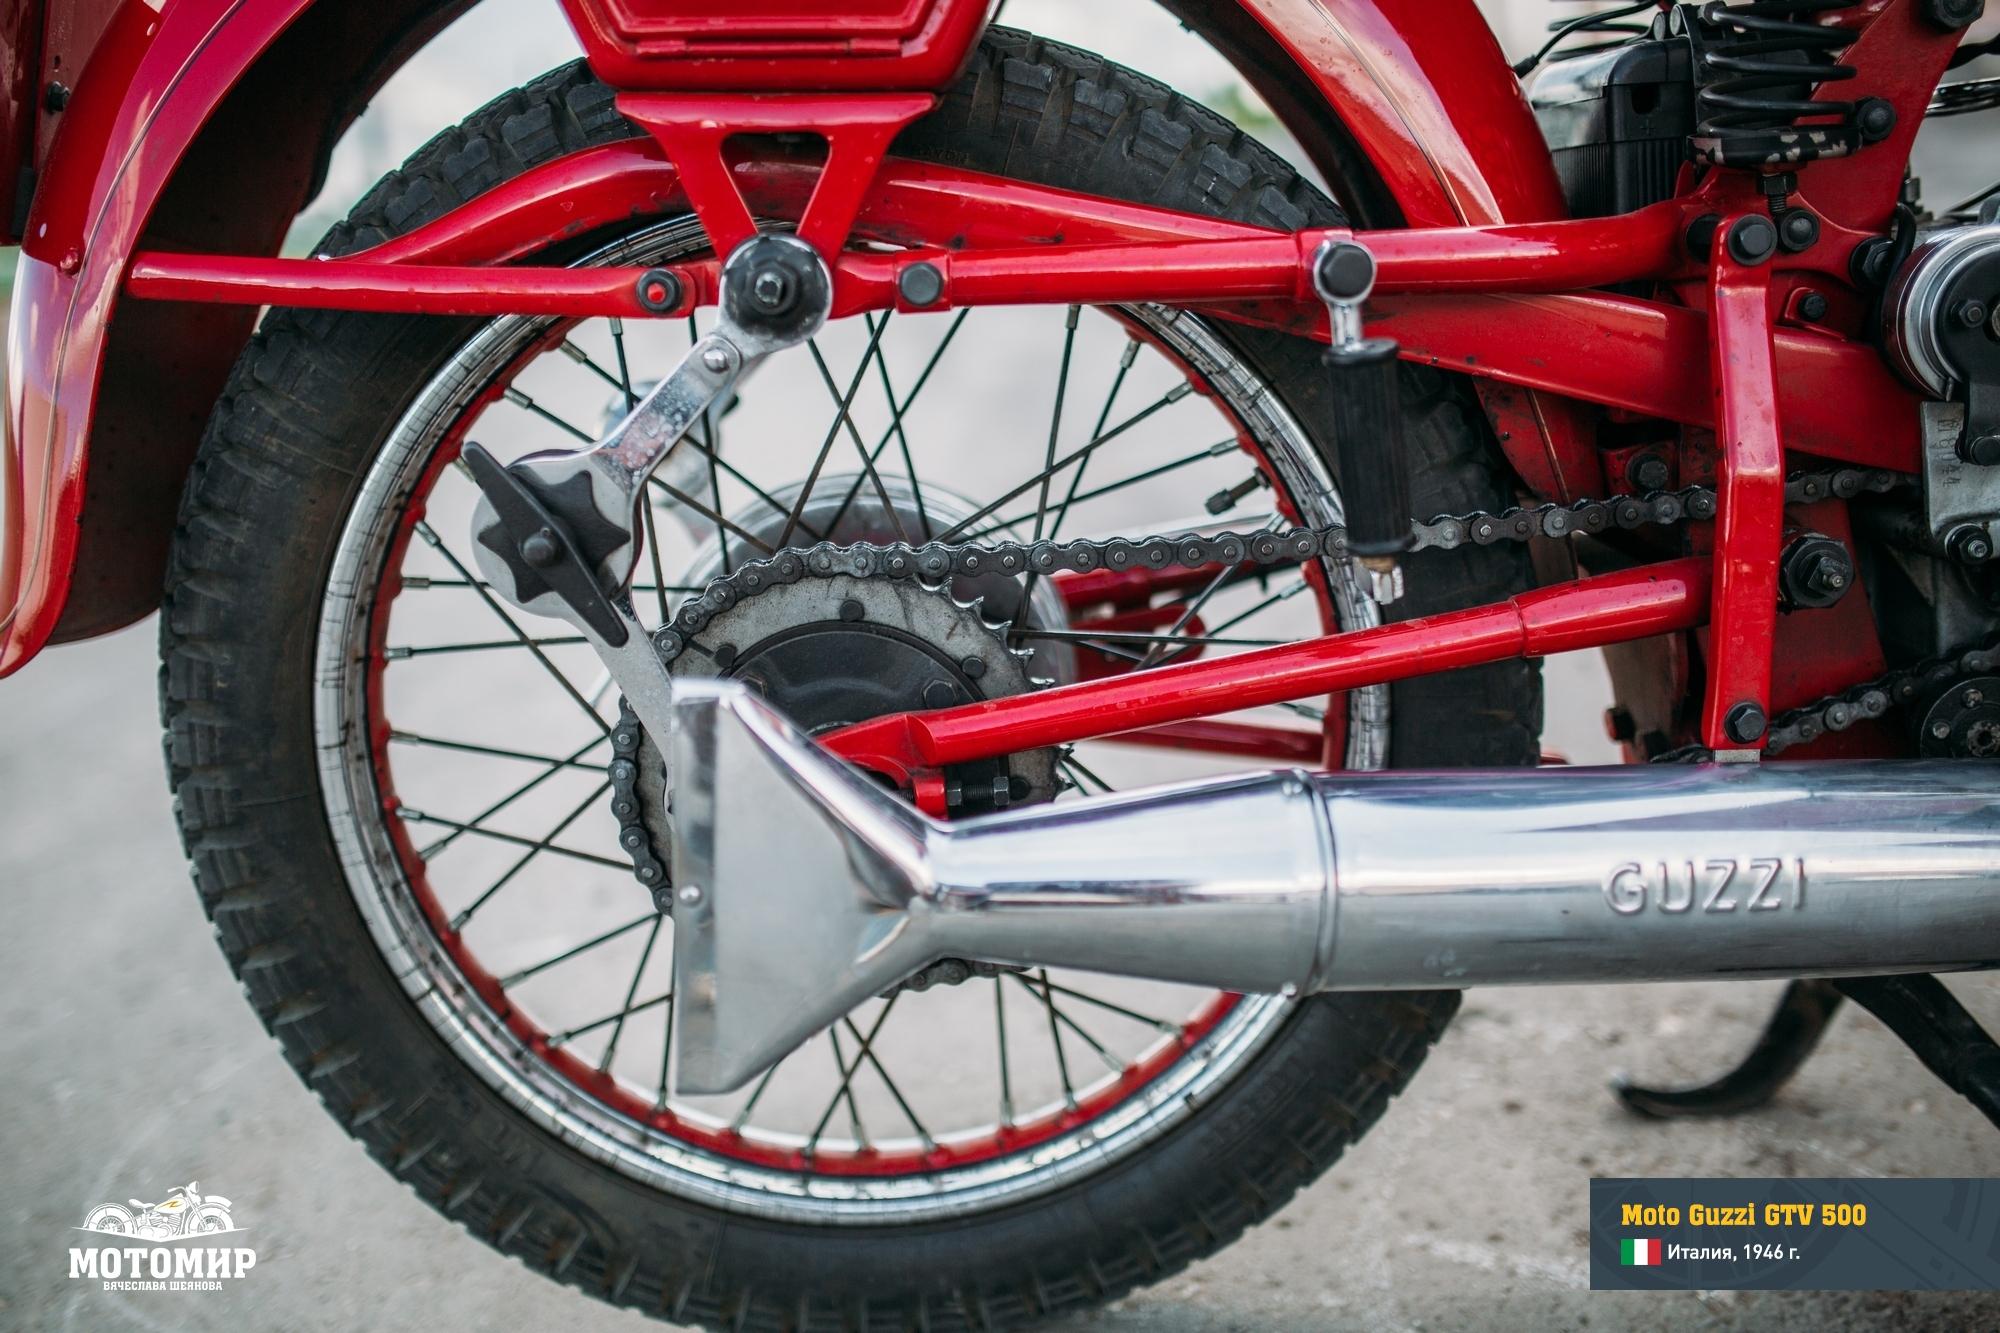 moto-guzzi-gtv-500-201509-web-36